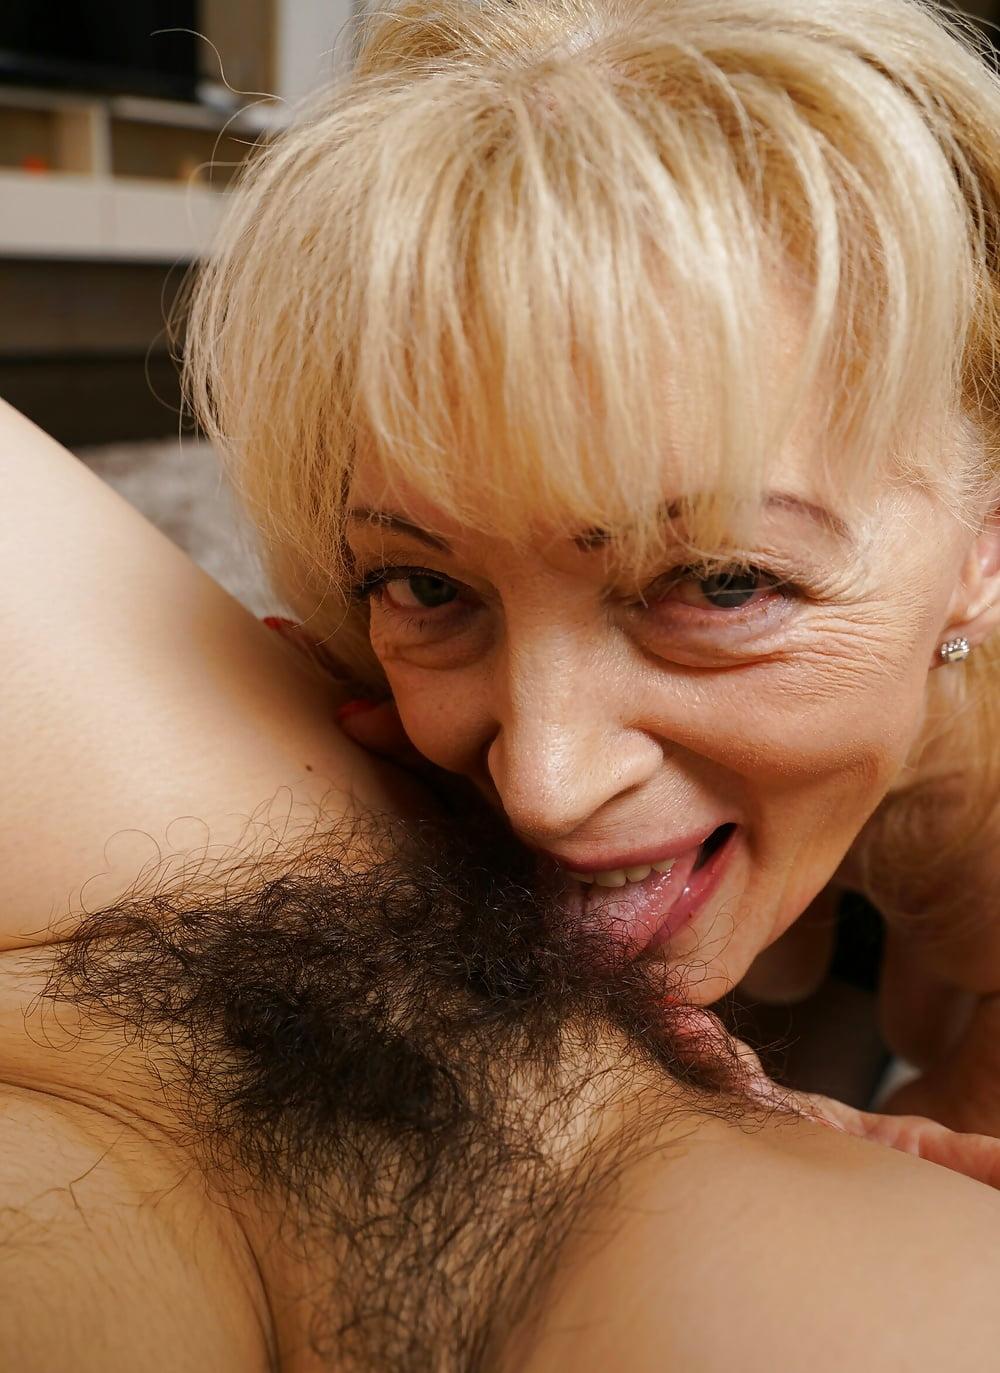 Free Hairy Lesbian Porn Galery